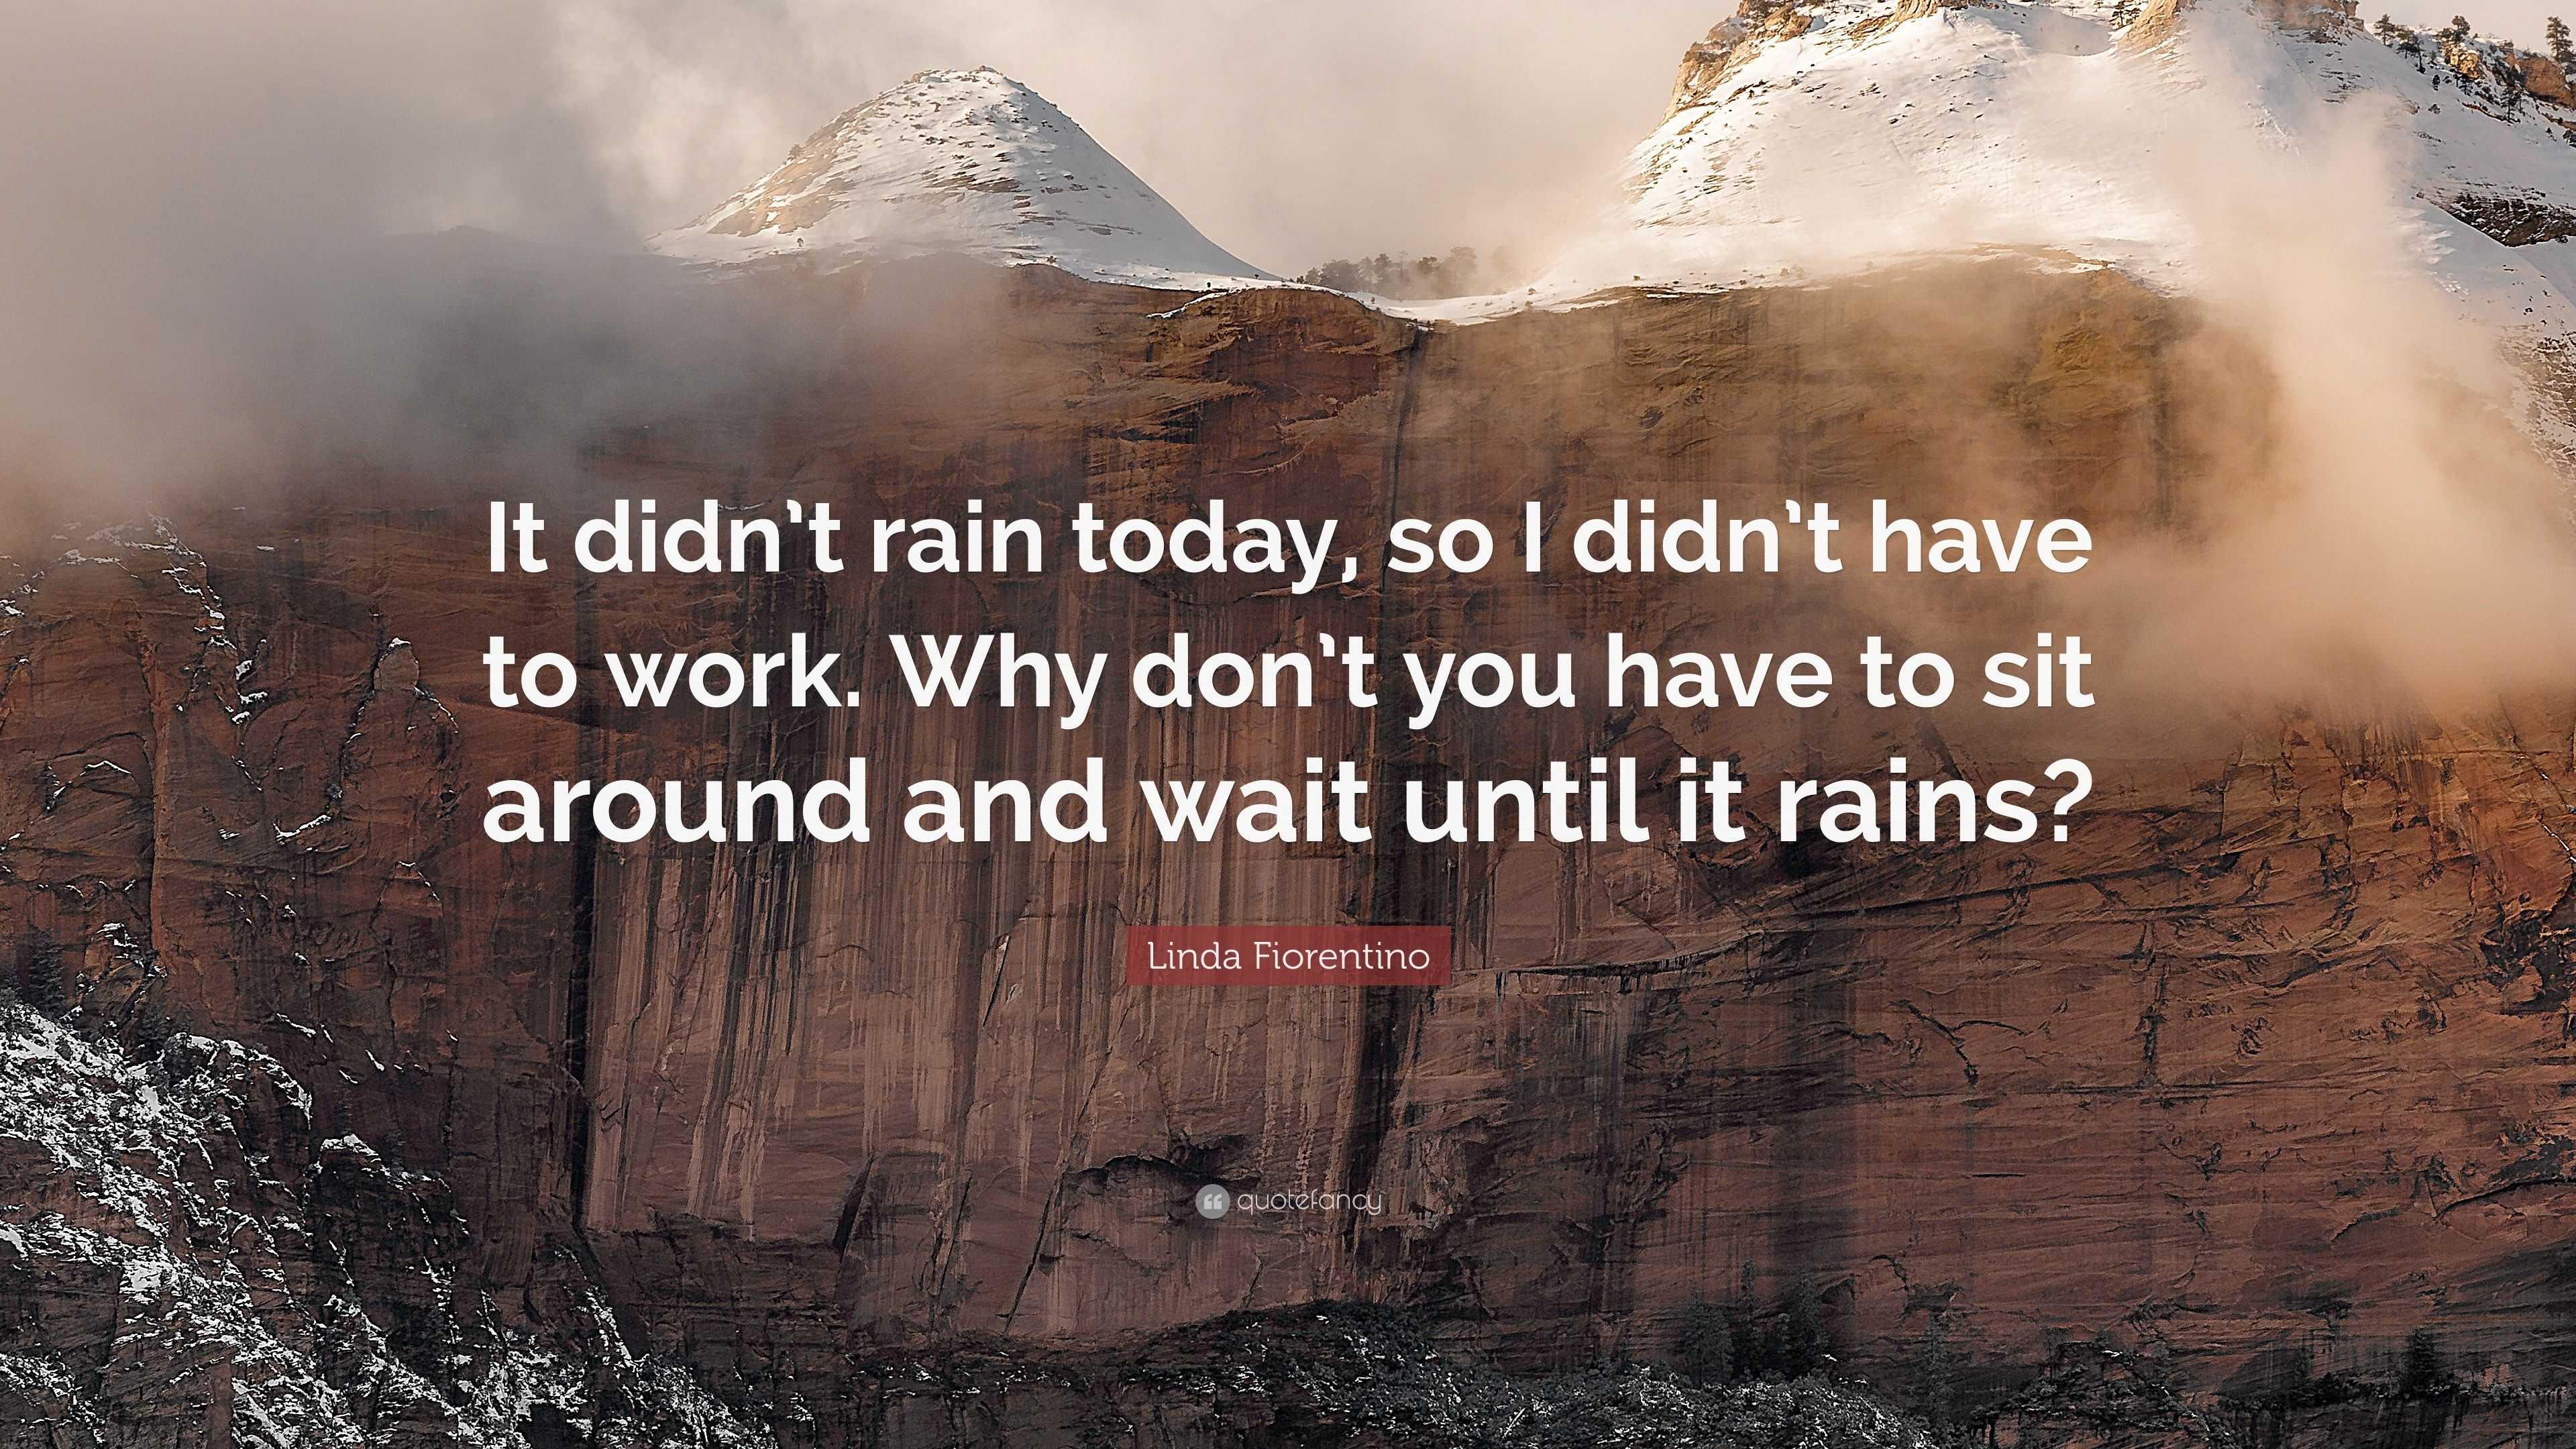 Nice Linda Fiorentino Quote: U201cIt Didnu0027t Rain Today, So I Didnu0027